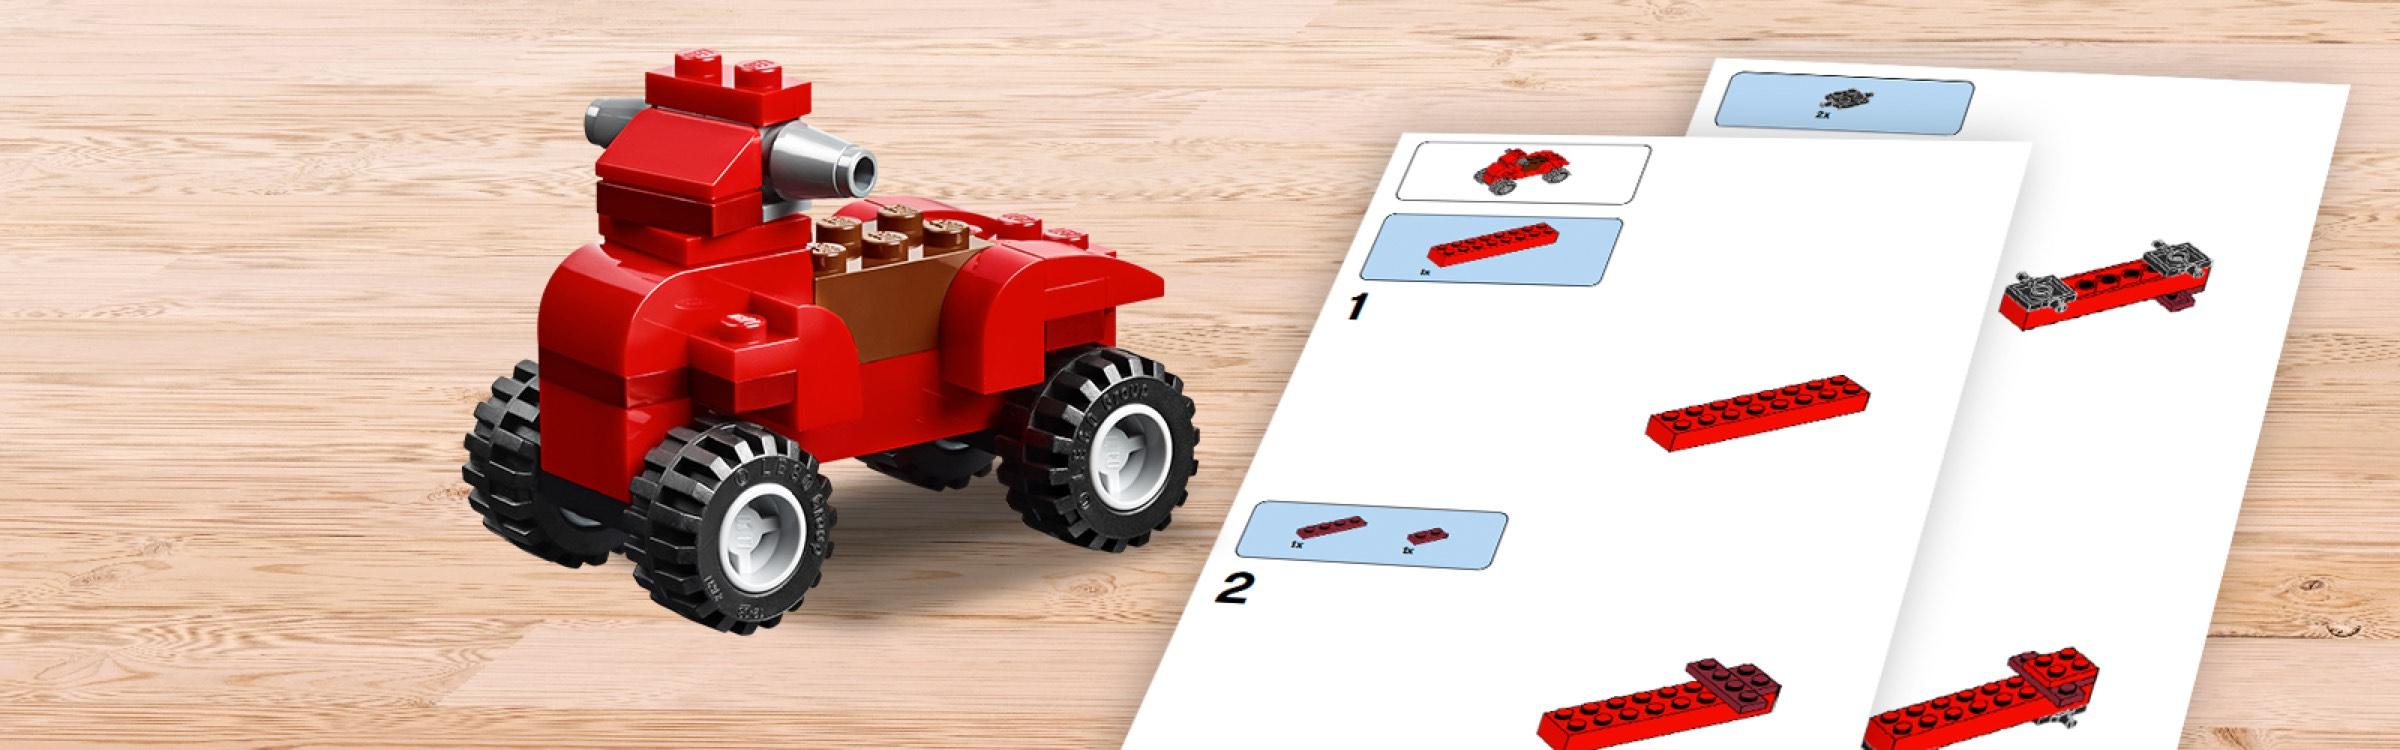 jouets lego classic instructions de